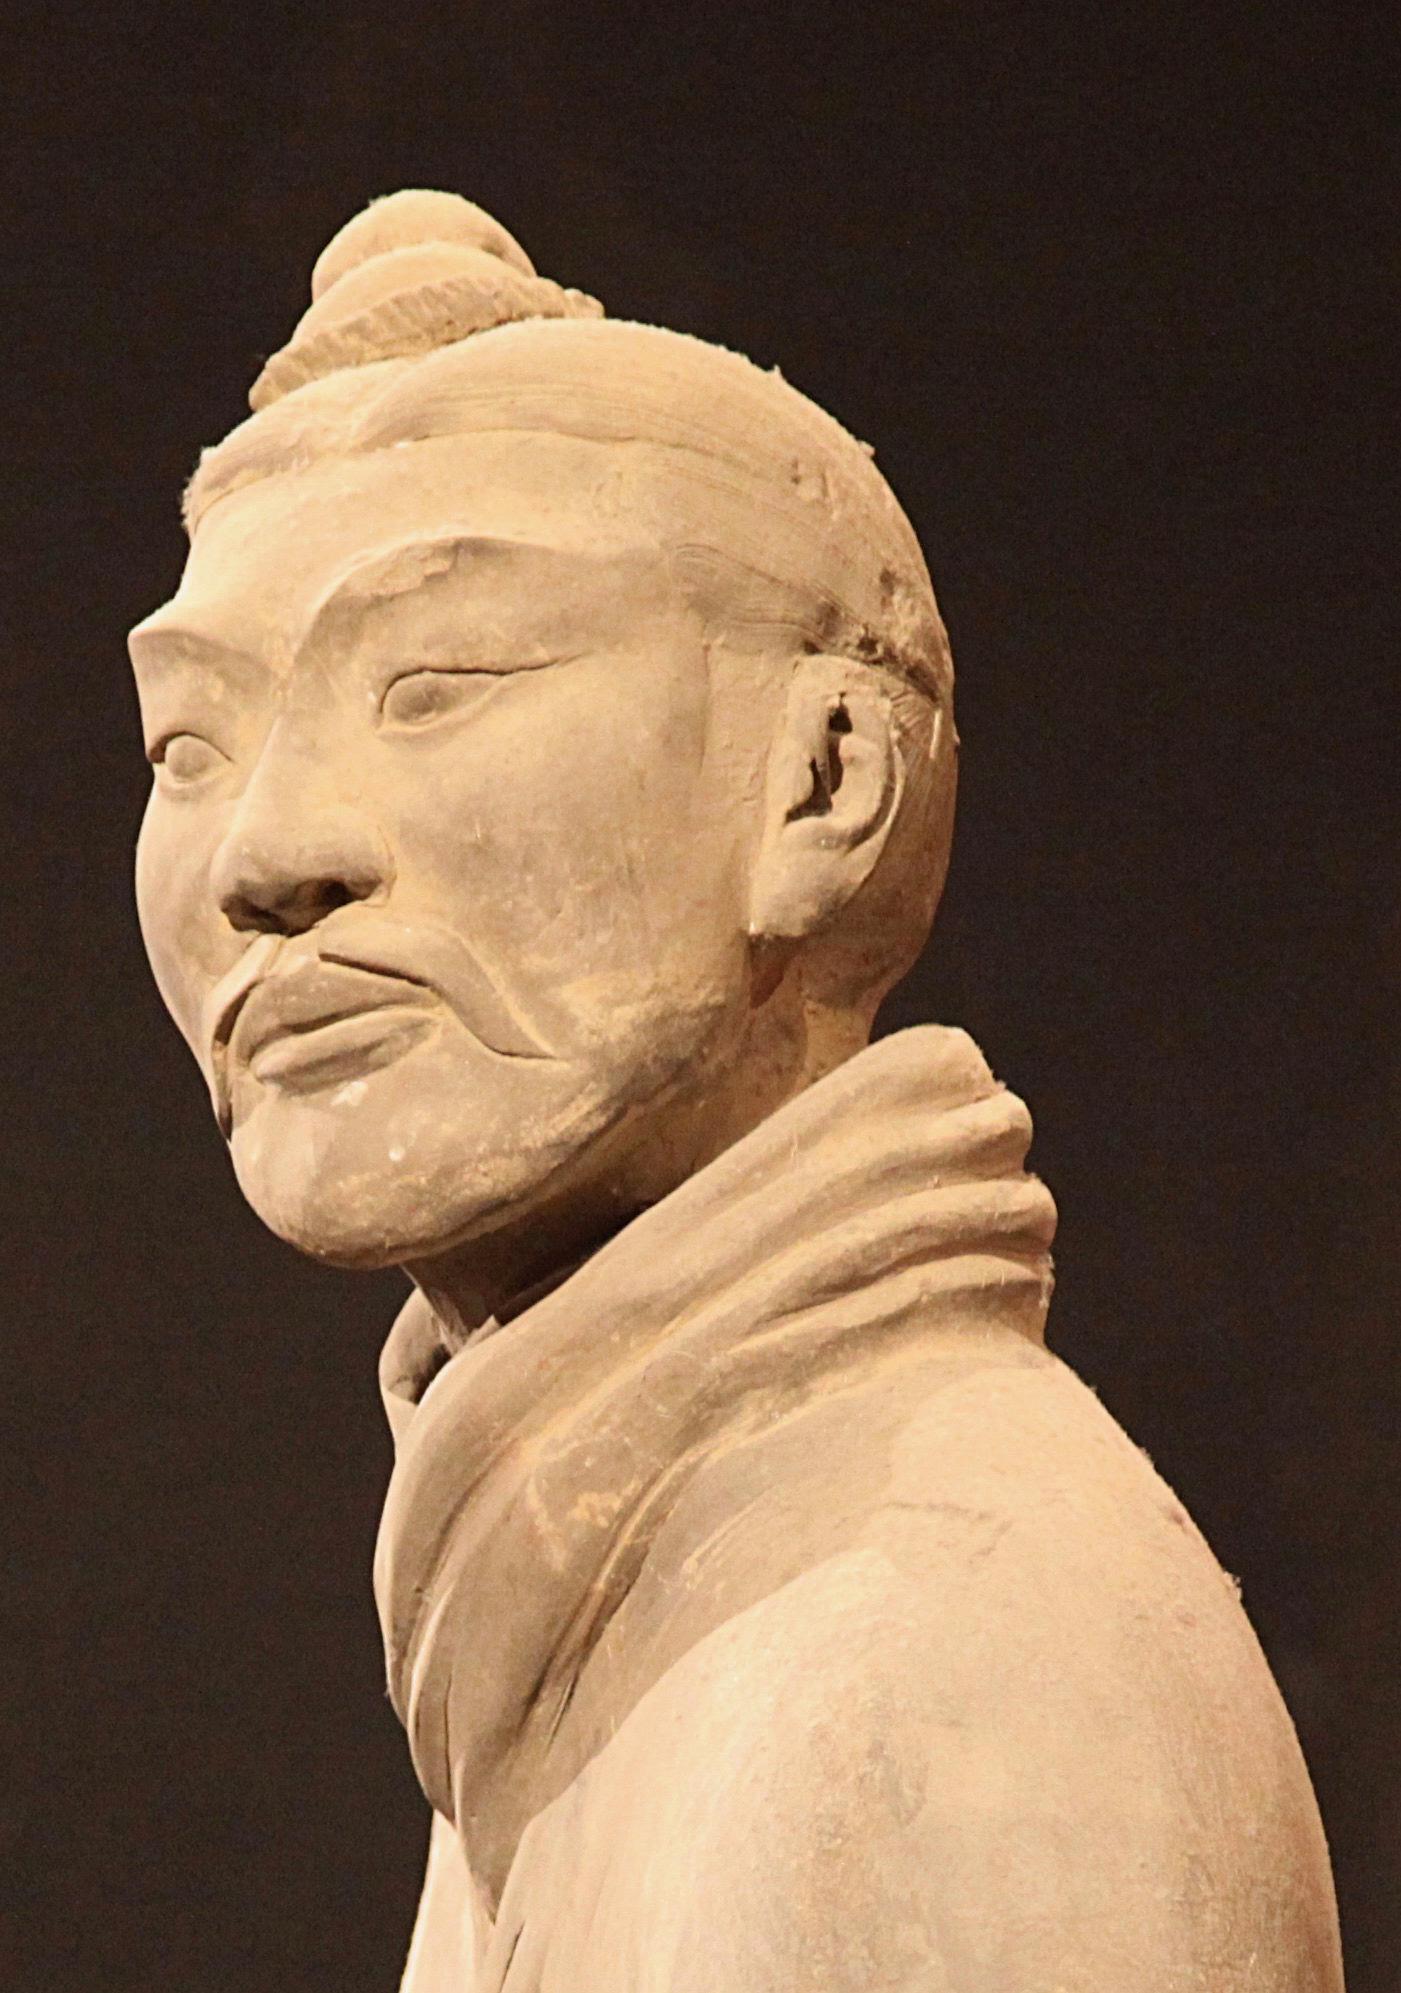 A Warrior in the Shaanxi History Museum. Photo ©Edward Burman